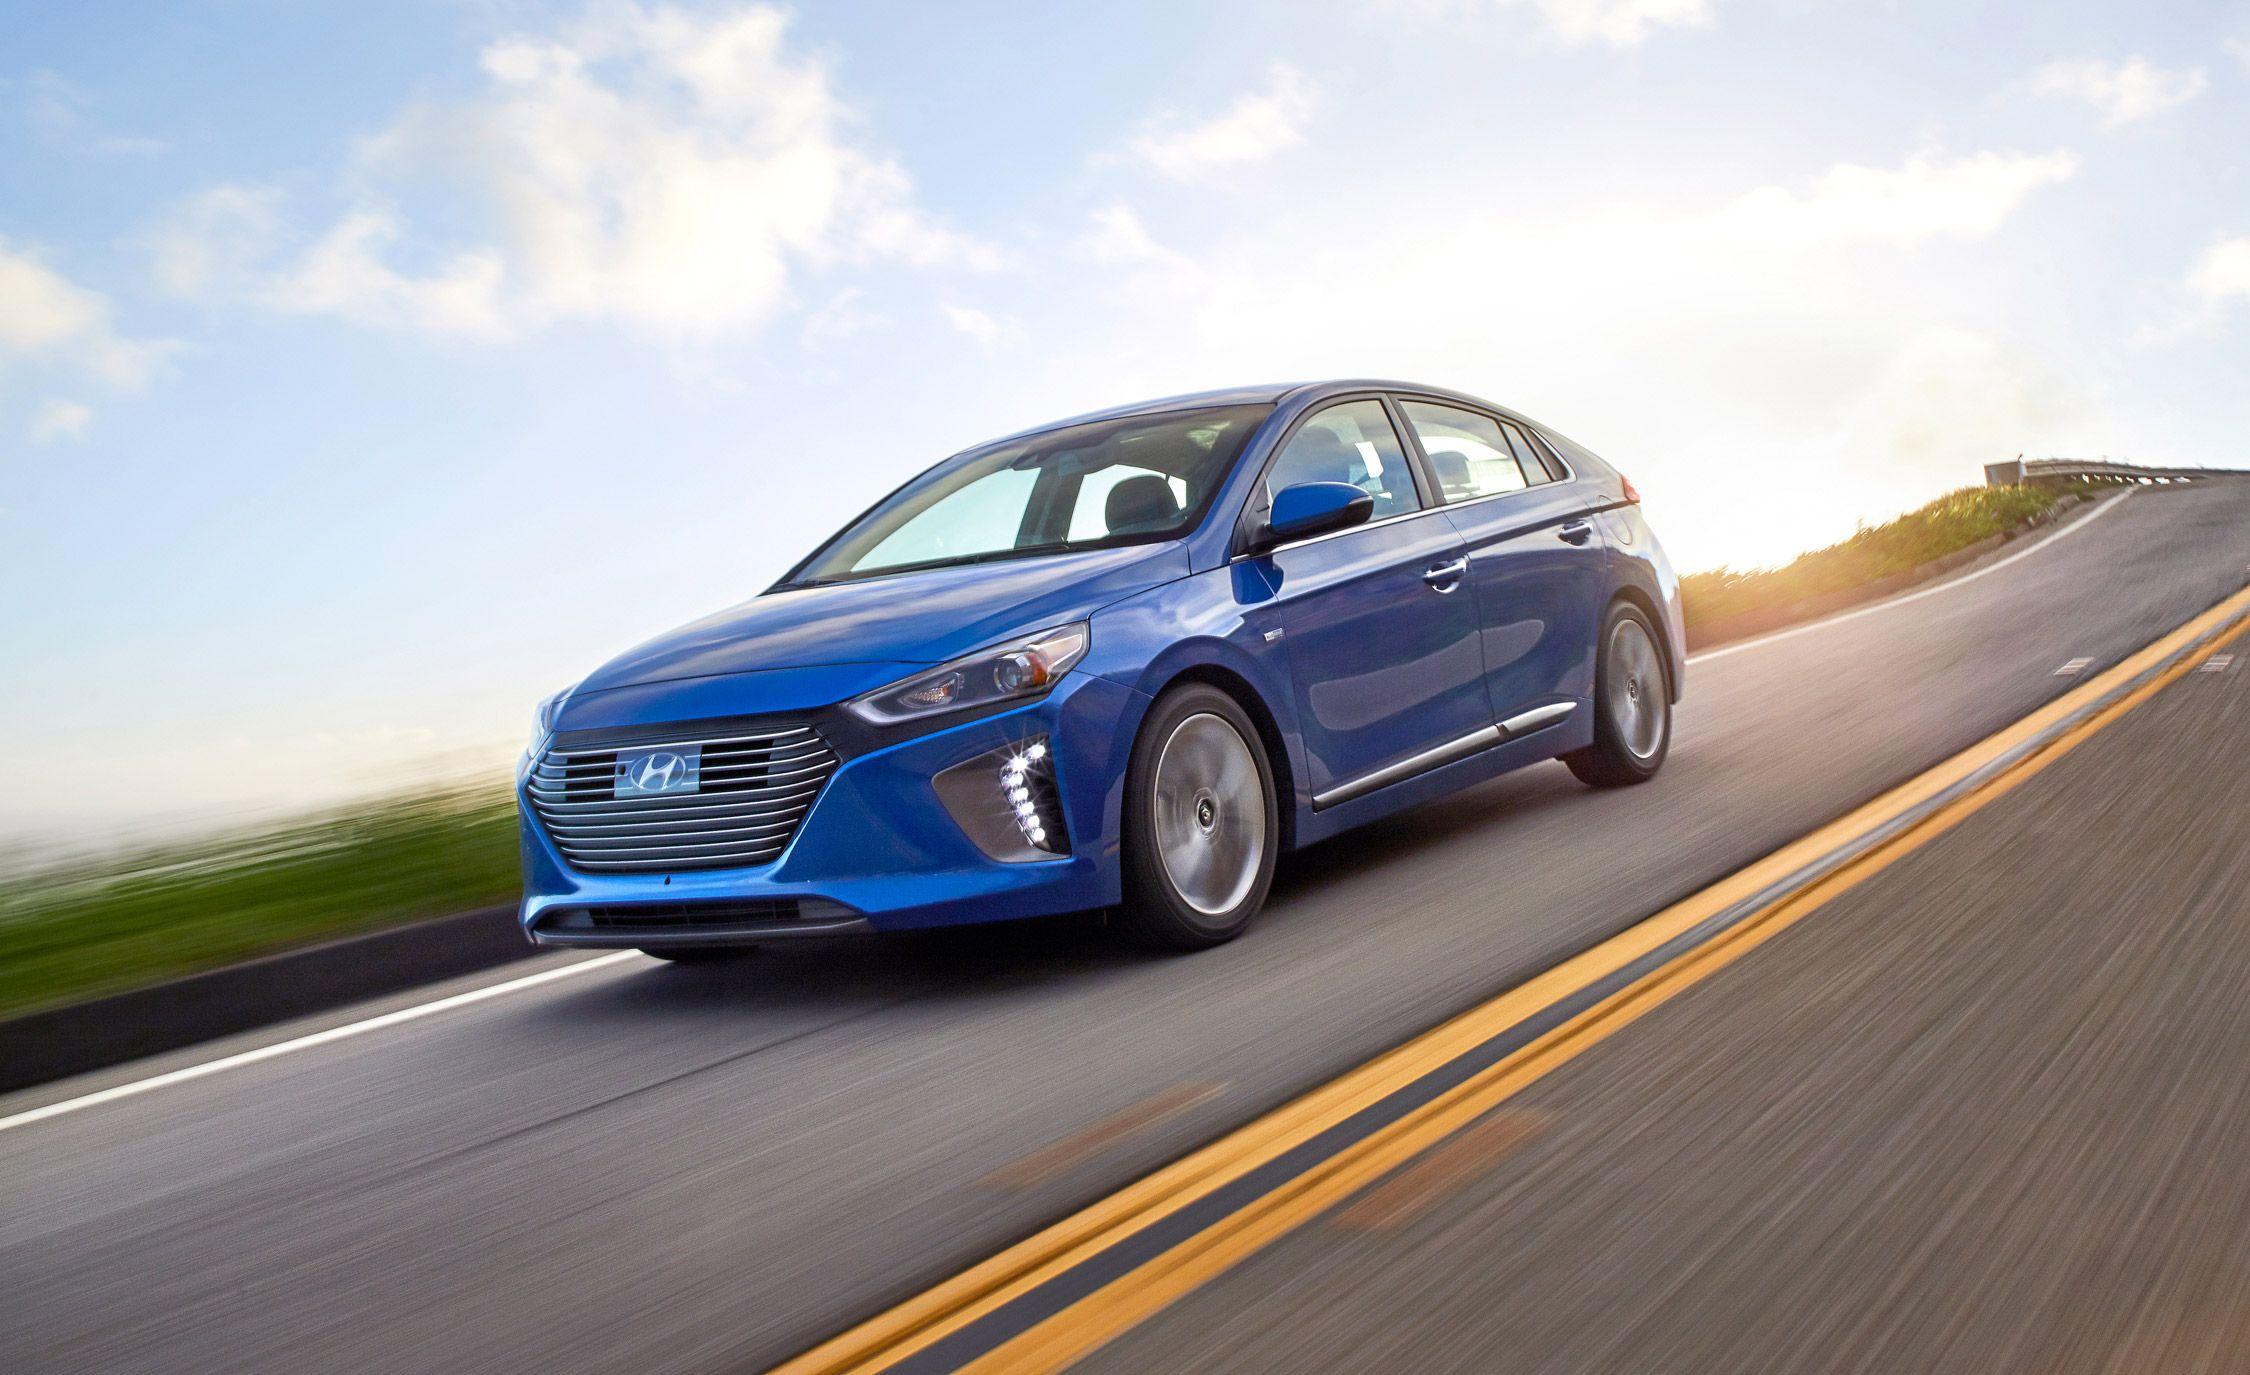 2017 Hyundai Ioniq Performance And Driving Impressions Review Car Driver